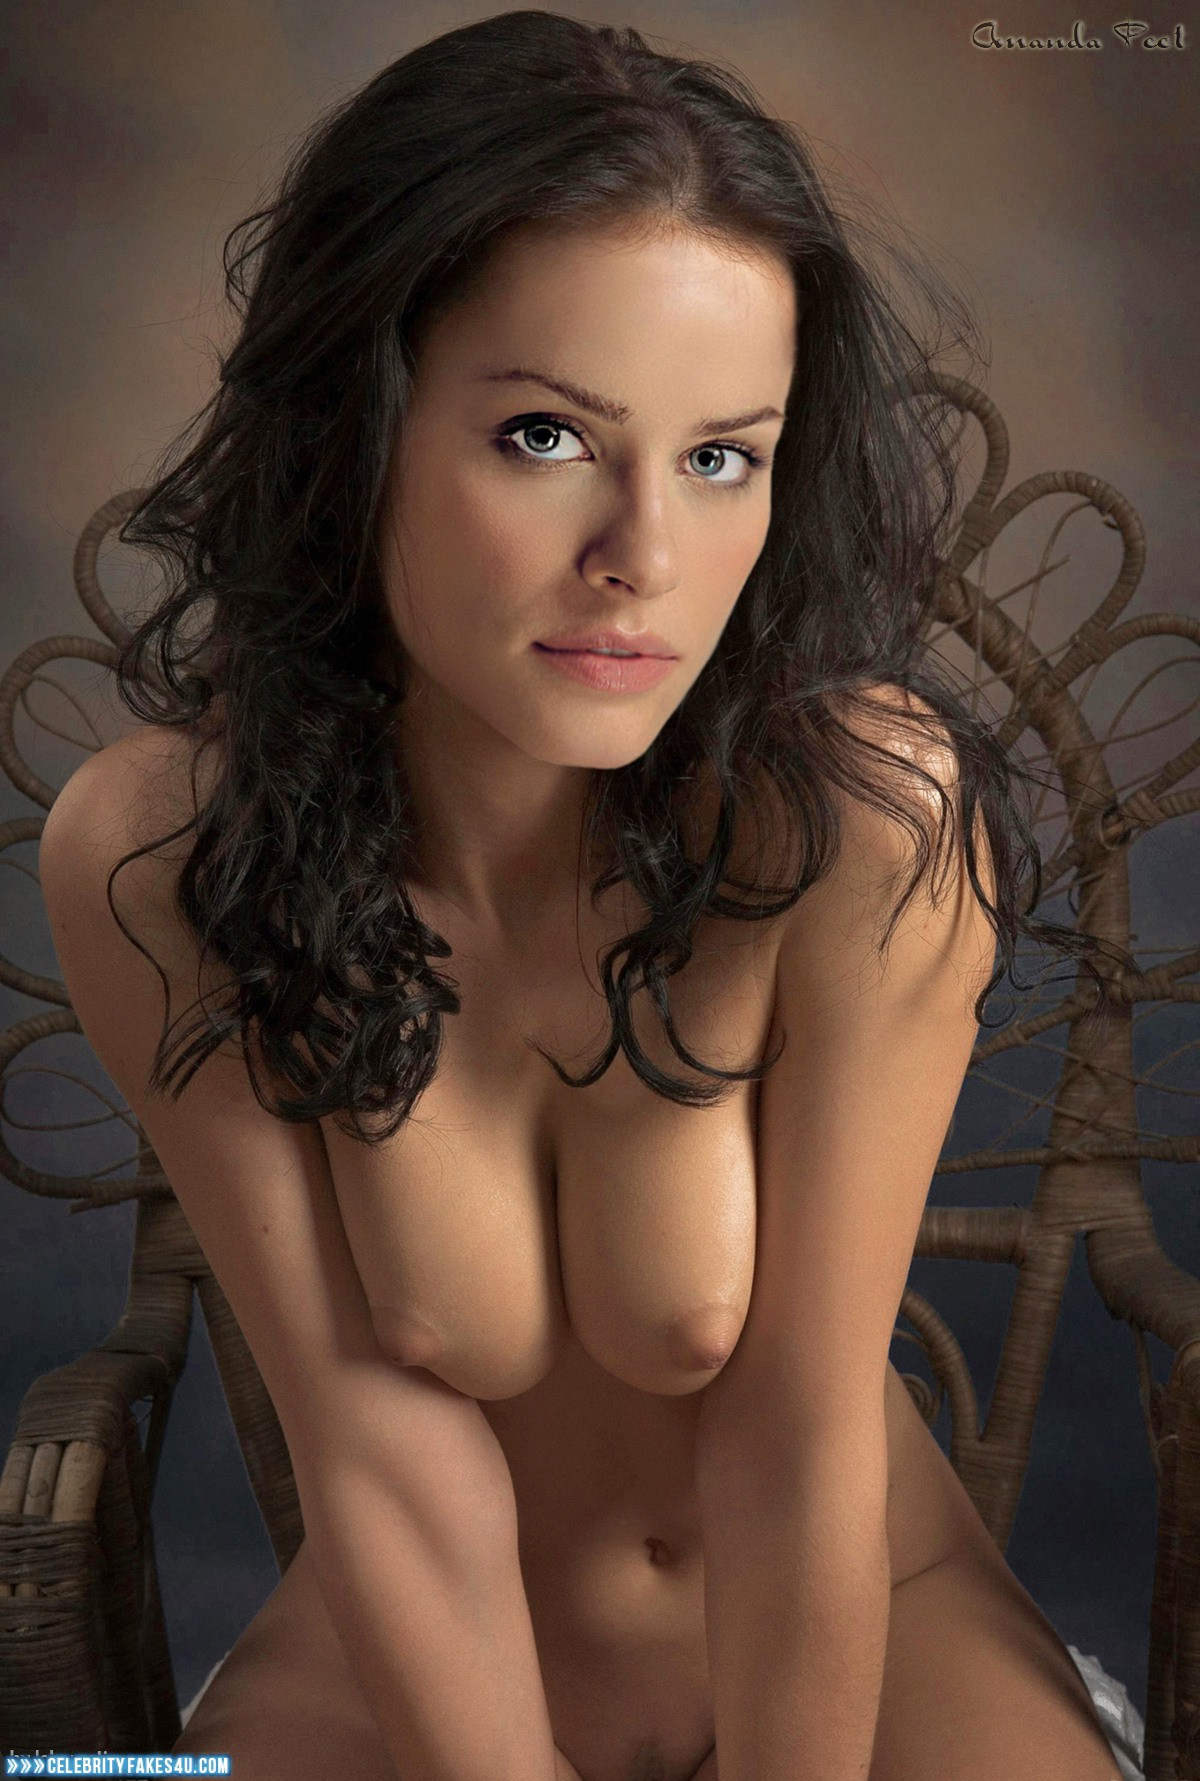 Amanda Peet Nude amanda peet nude boobs squeezed 001 « celebrity fakes 4u